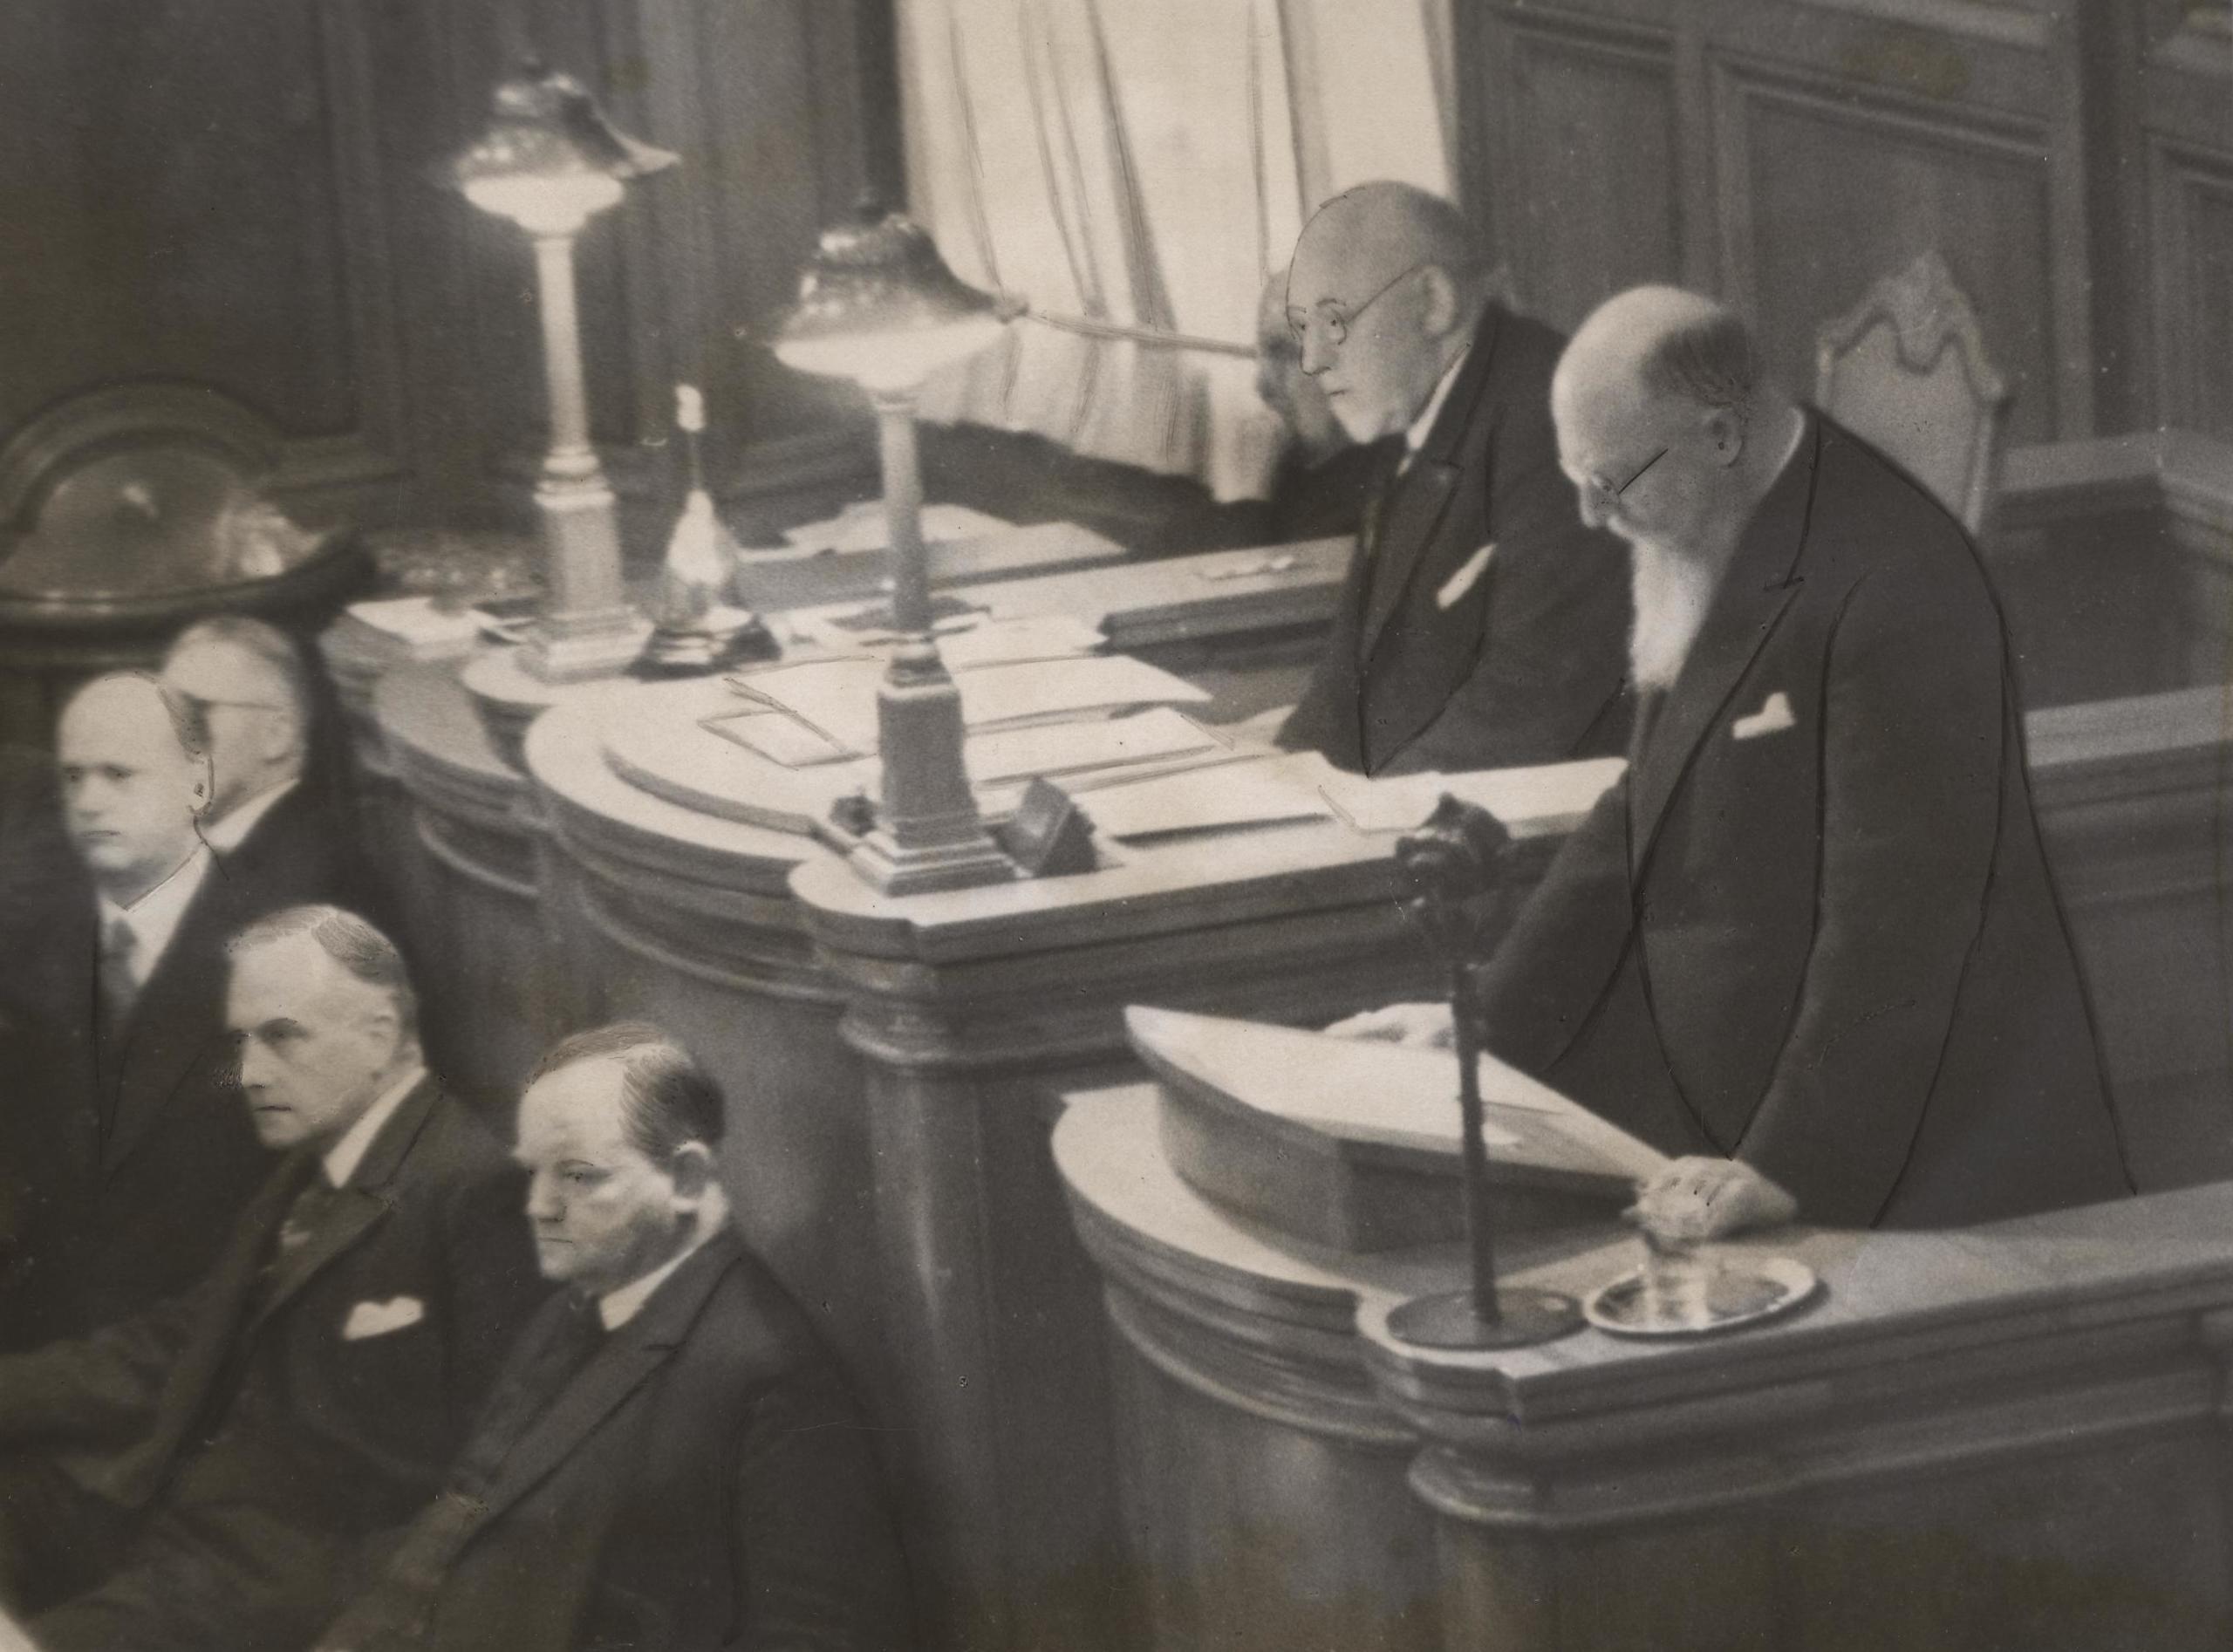 Stauning på Folketingets talerstol, 27. februar 1939.